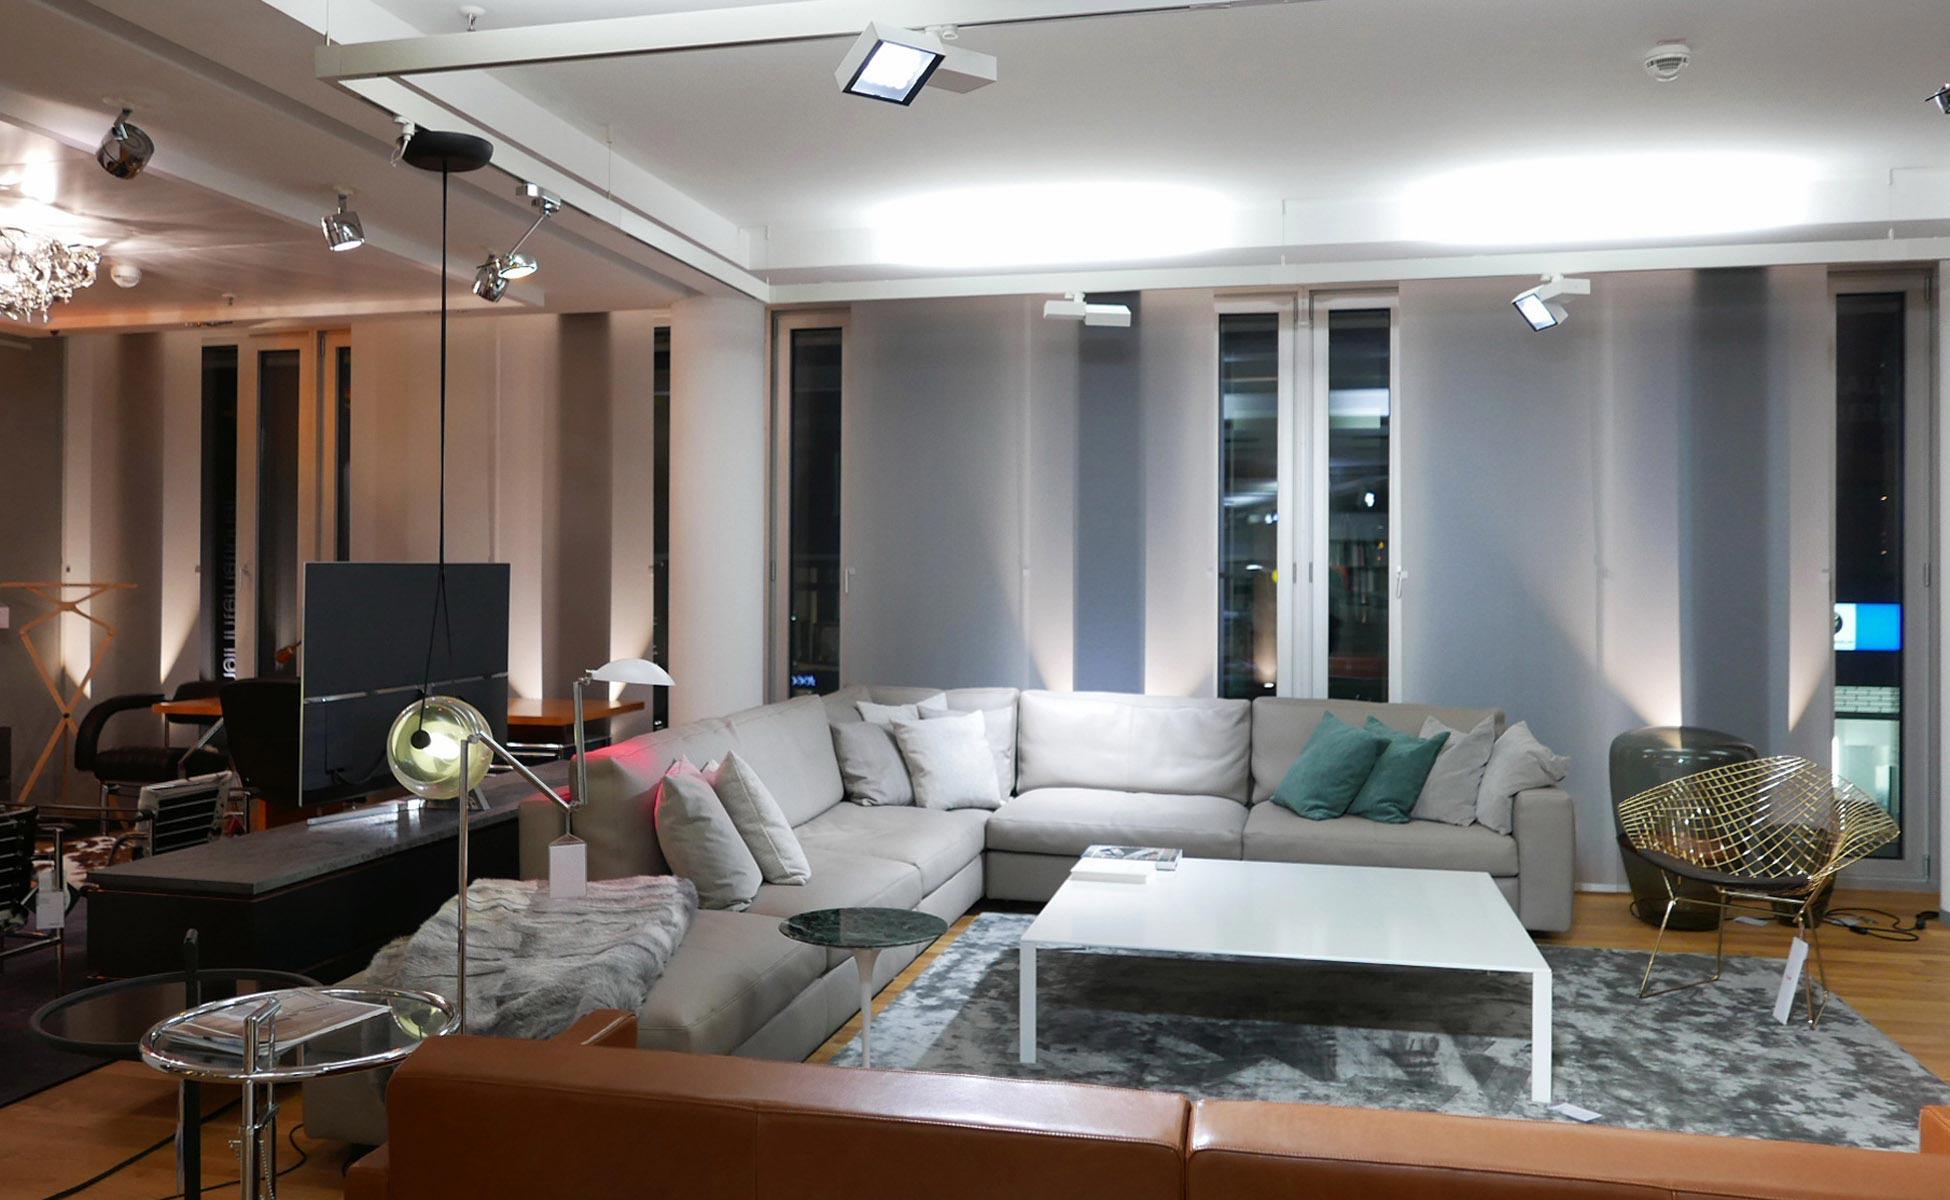 poltrona frau massimo systema sofa im steidten+ showroom in berlin